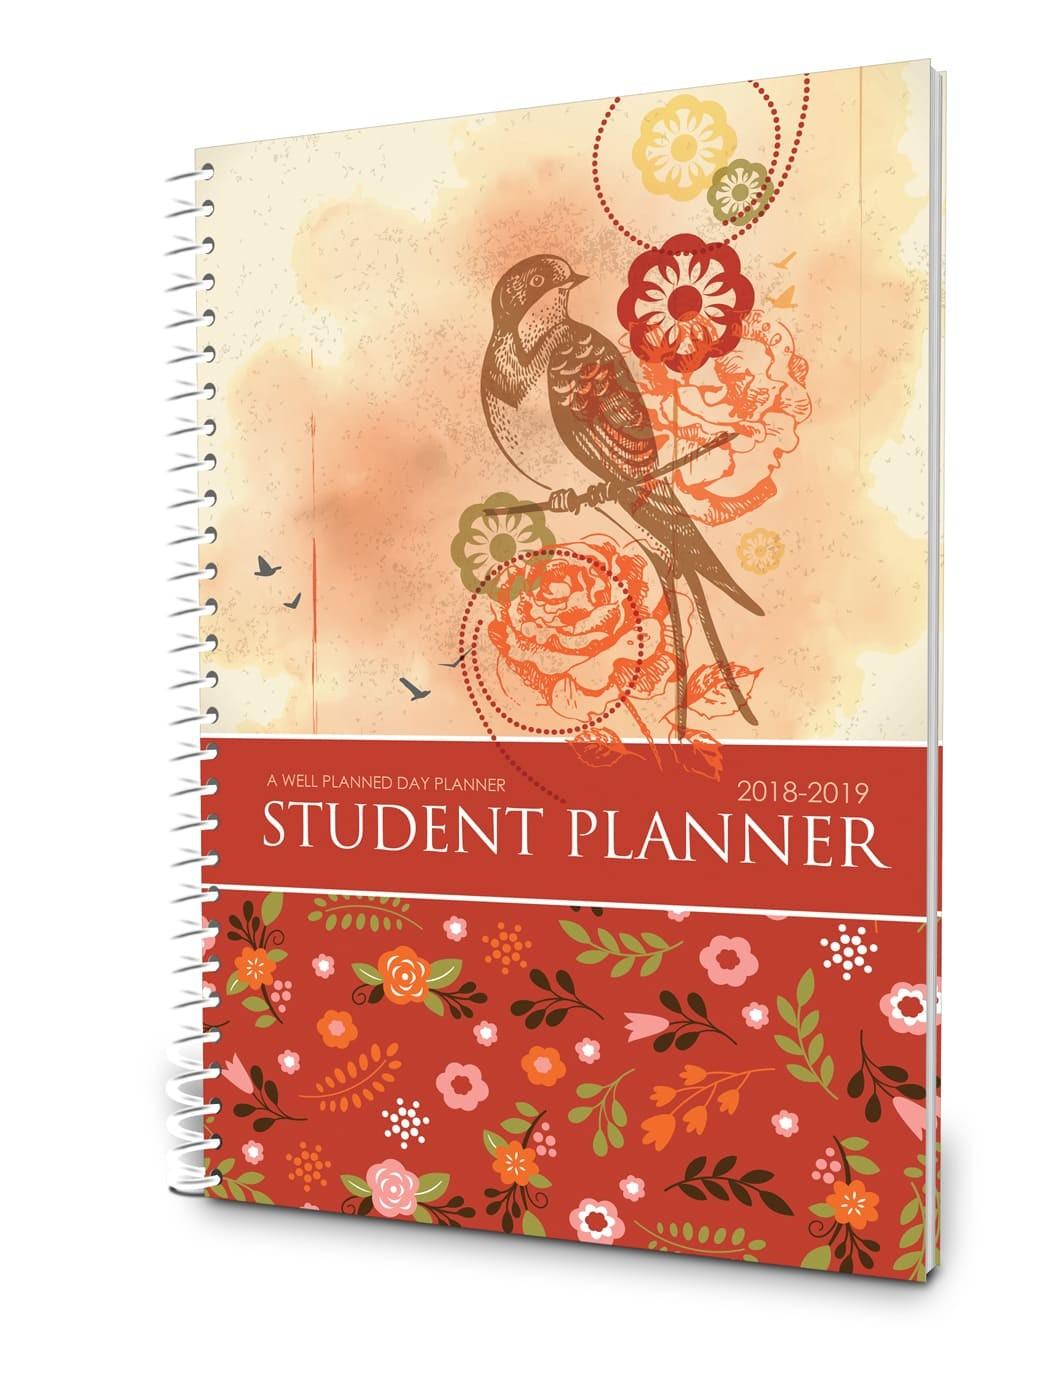 Student Planner - Floral